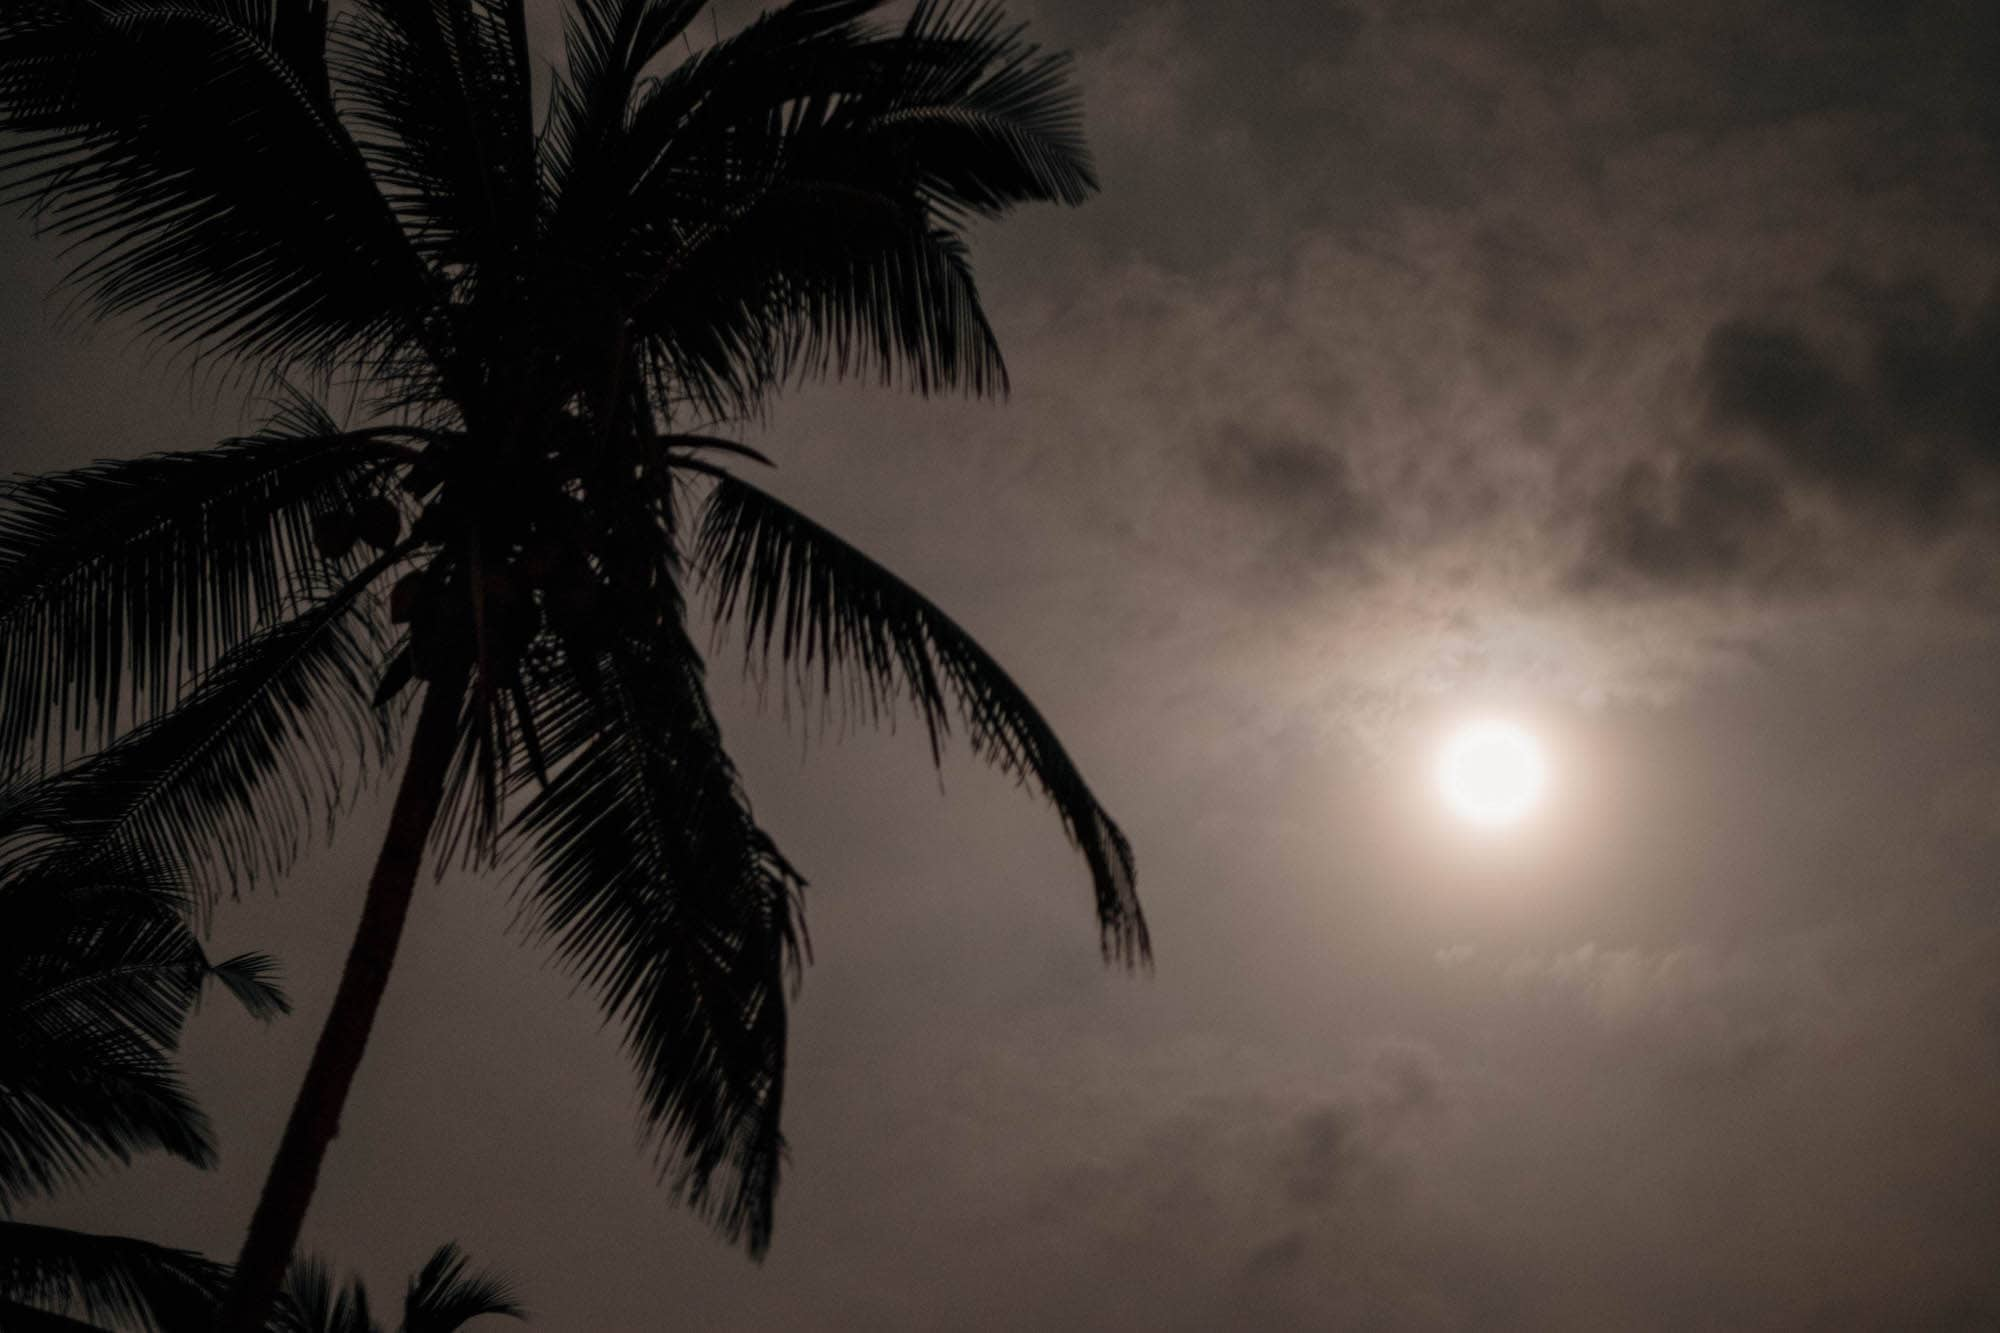 Vollmond, Poya Day in Sri Lanka Mond mit Palme